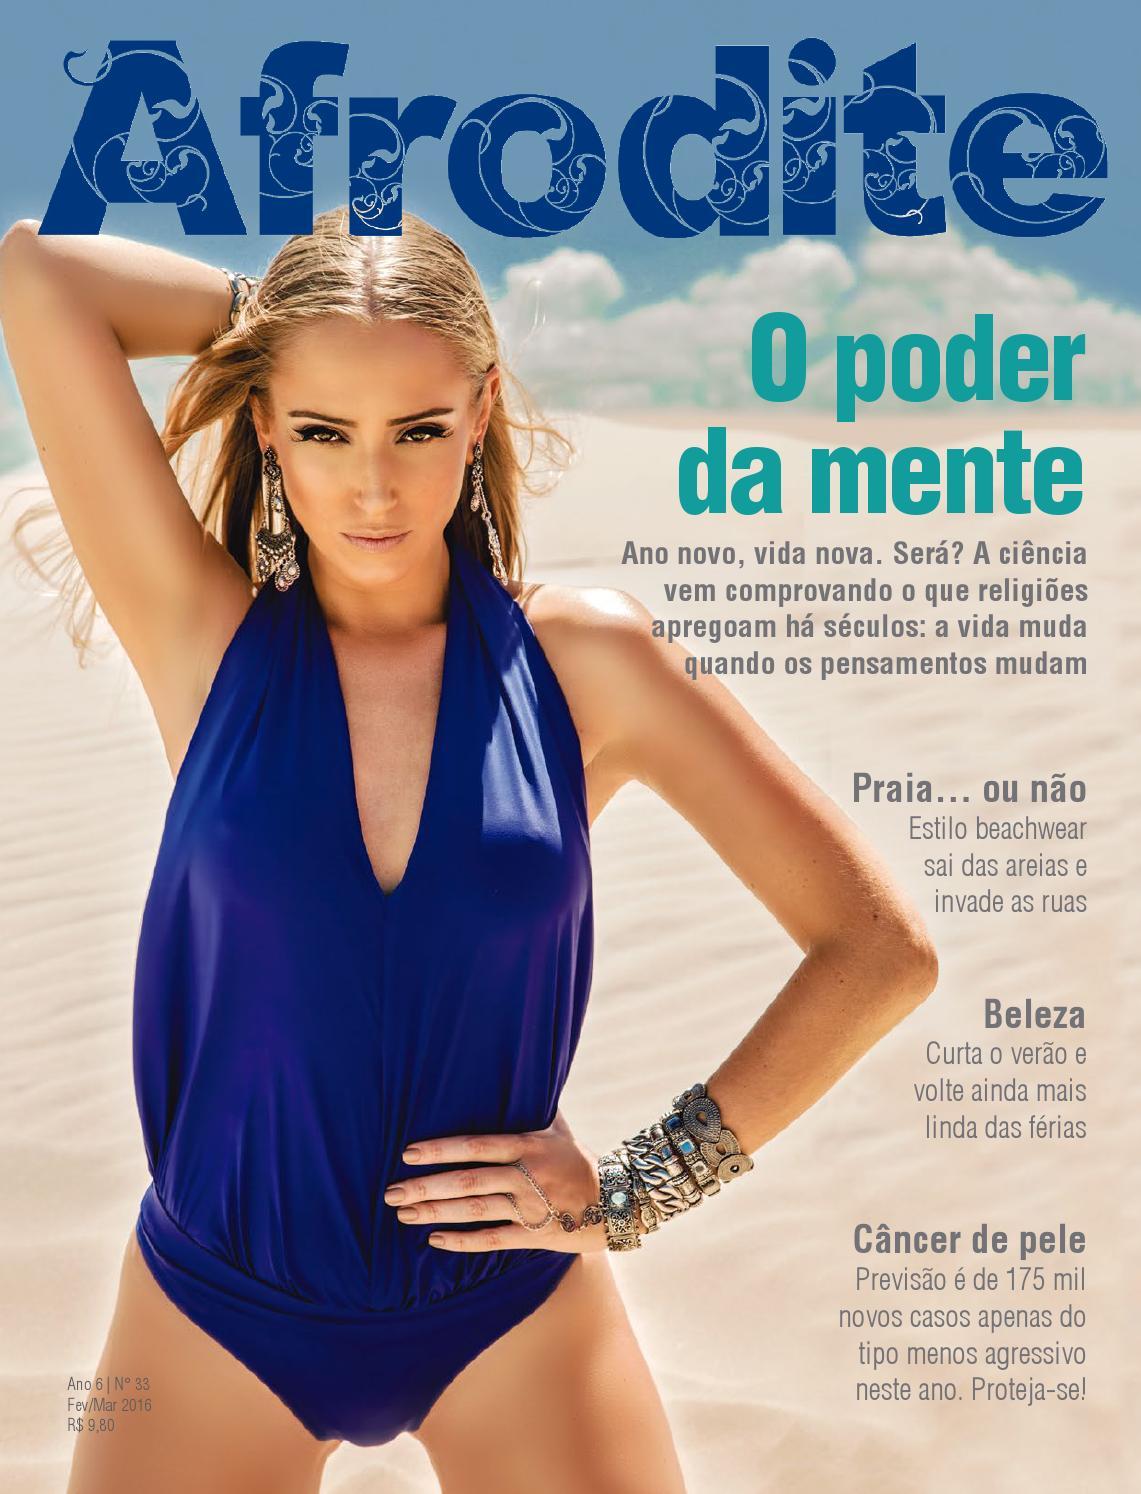 49f66baa97052 Afrodite33 by RevistaAfrodite - issuu